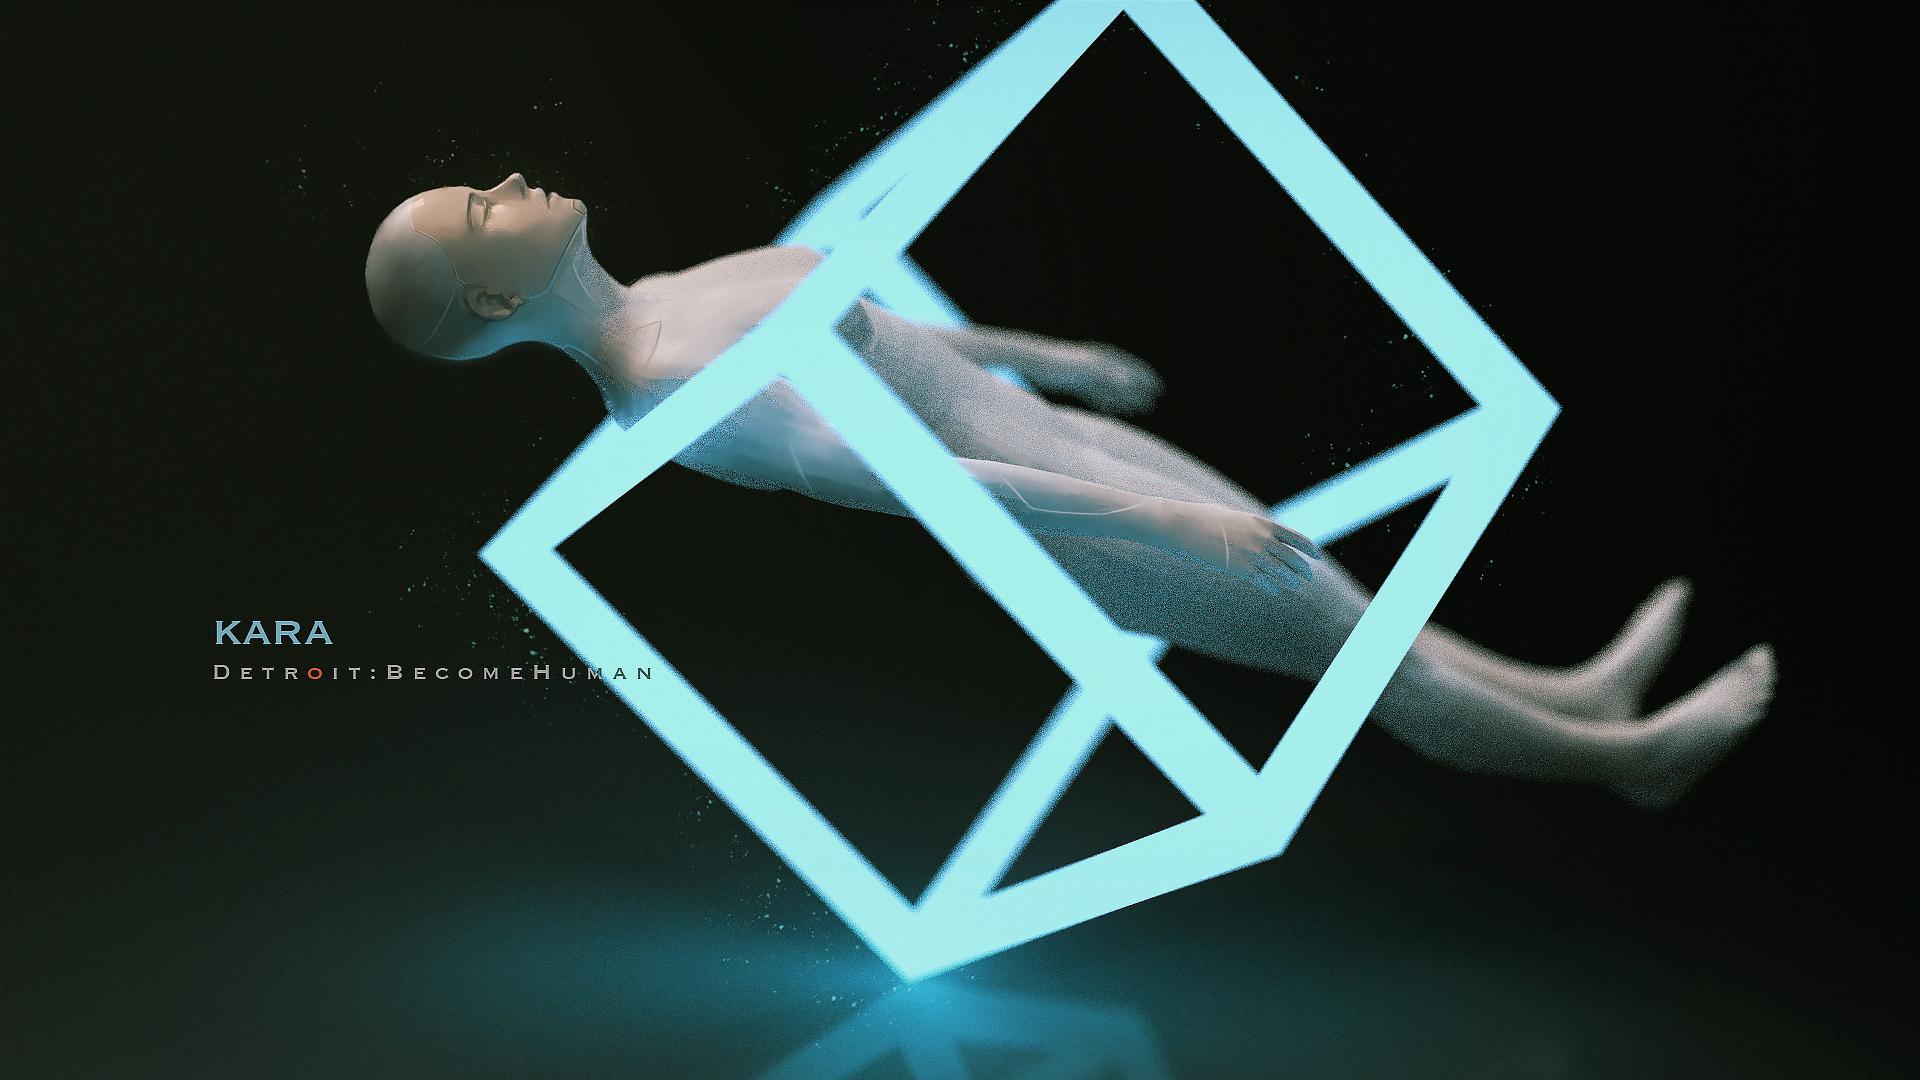 Kara Detroit Become Human Wallpaper 2365407 Zerochan Anime